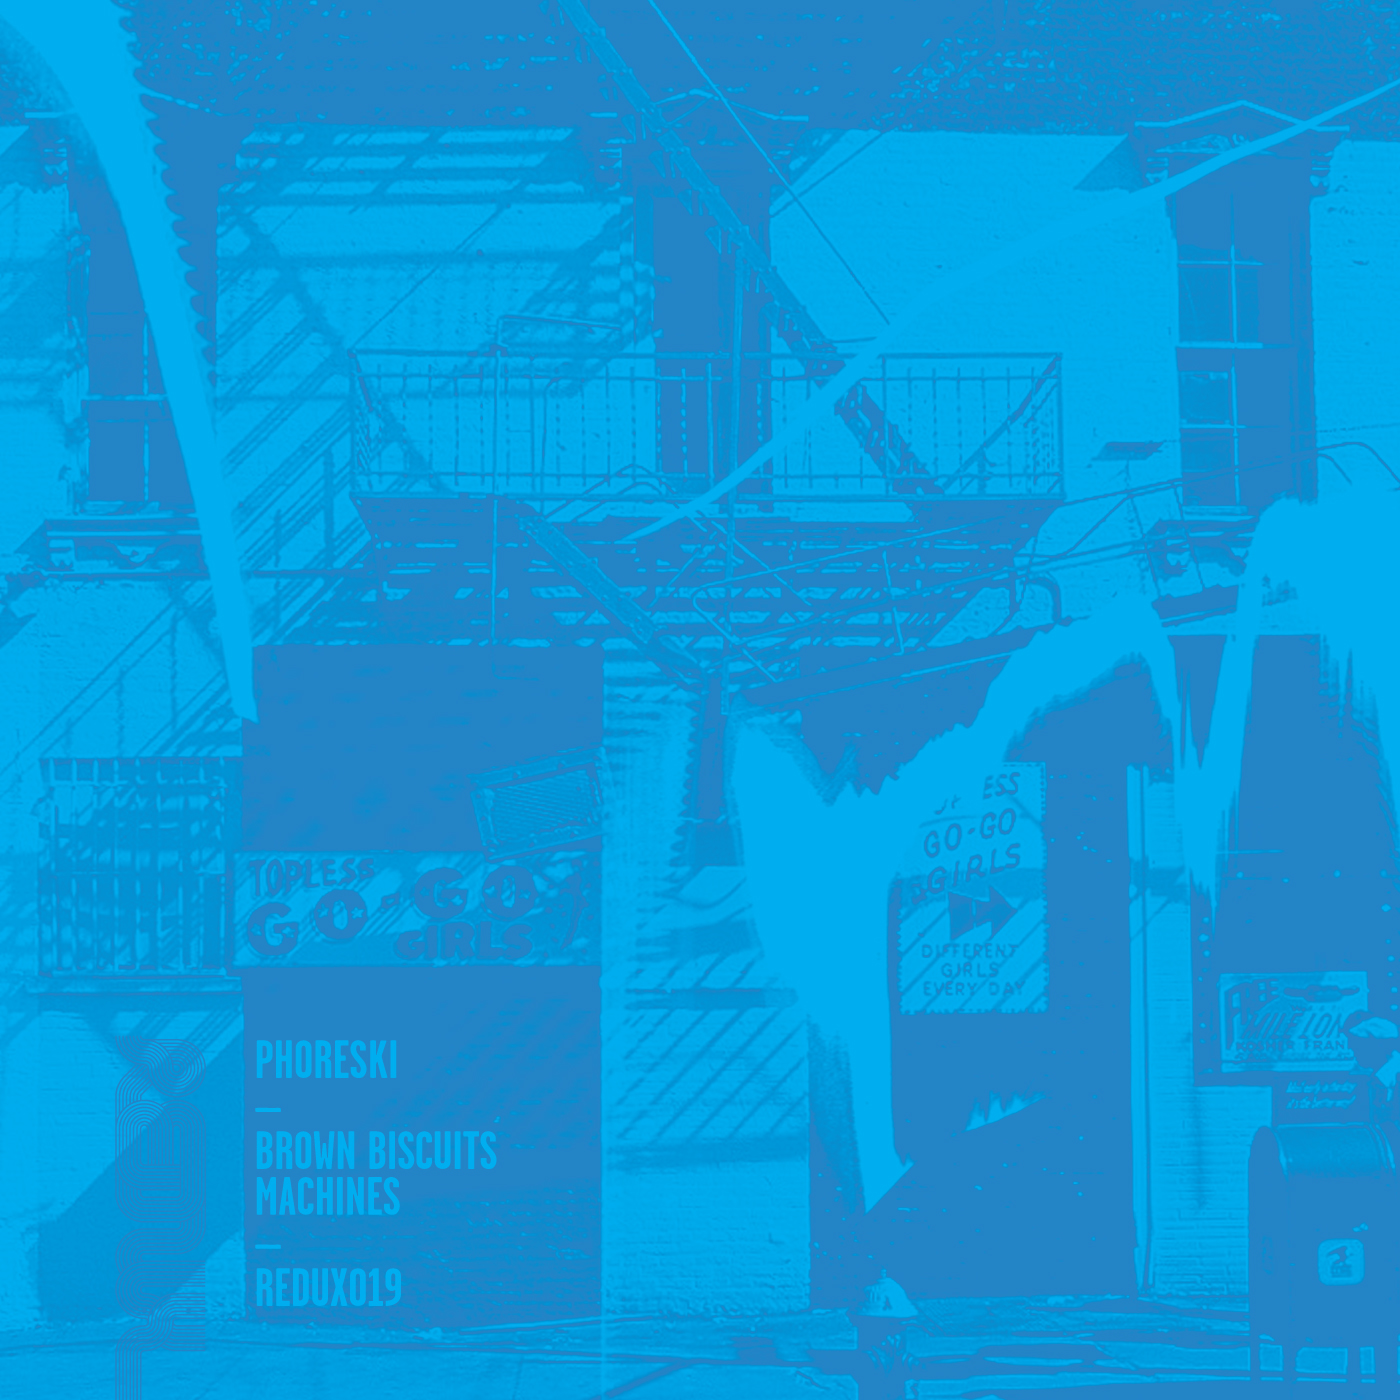 Reviews, Promo`d, Test Pressing, Dr Rob, Phoreski, Redux, Emile Strunz, Porn Wax, Tusk Wax, Kurt Baggaley, Bohemian Club, Jose Manuel, Juan Laya, Jorge Montiel, Imagenes